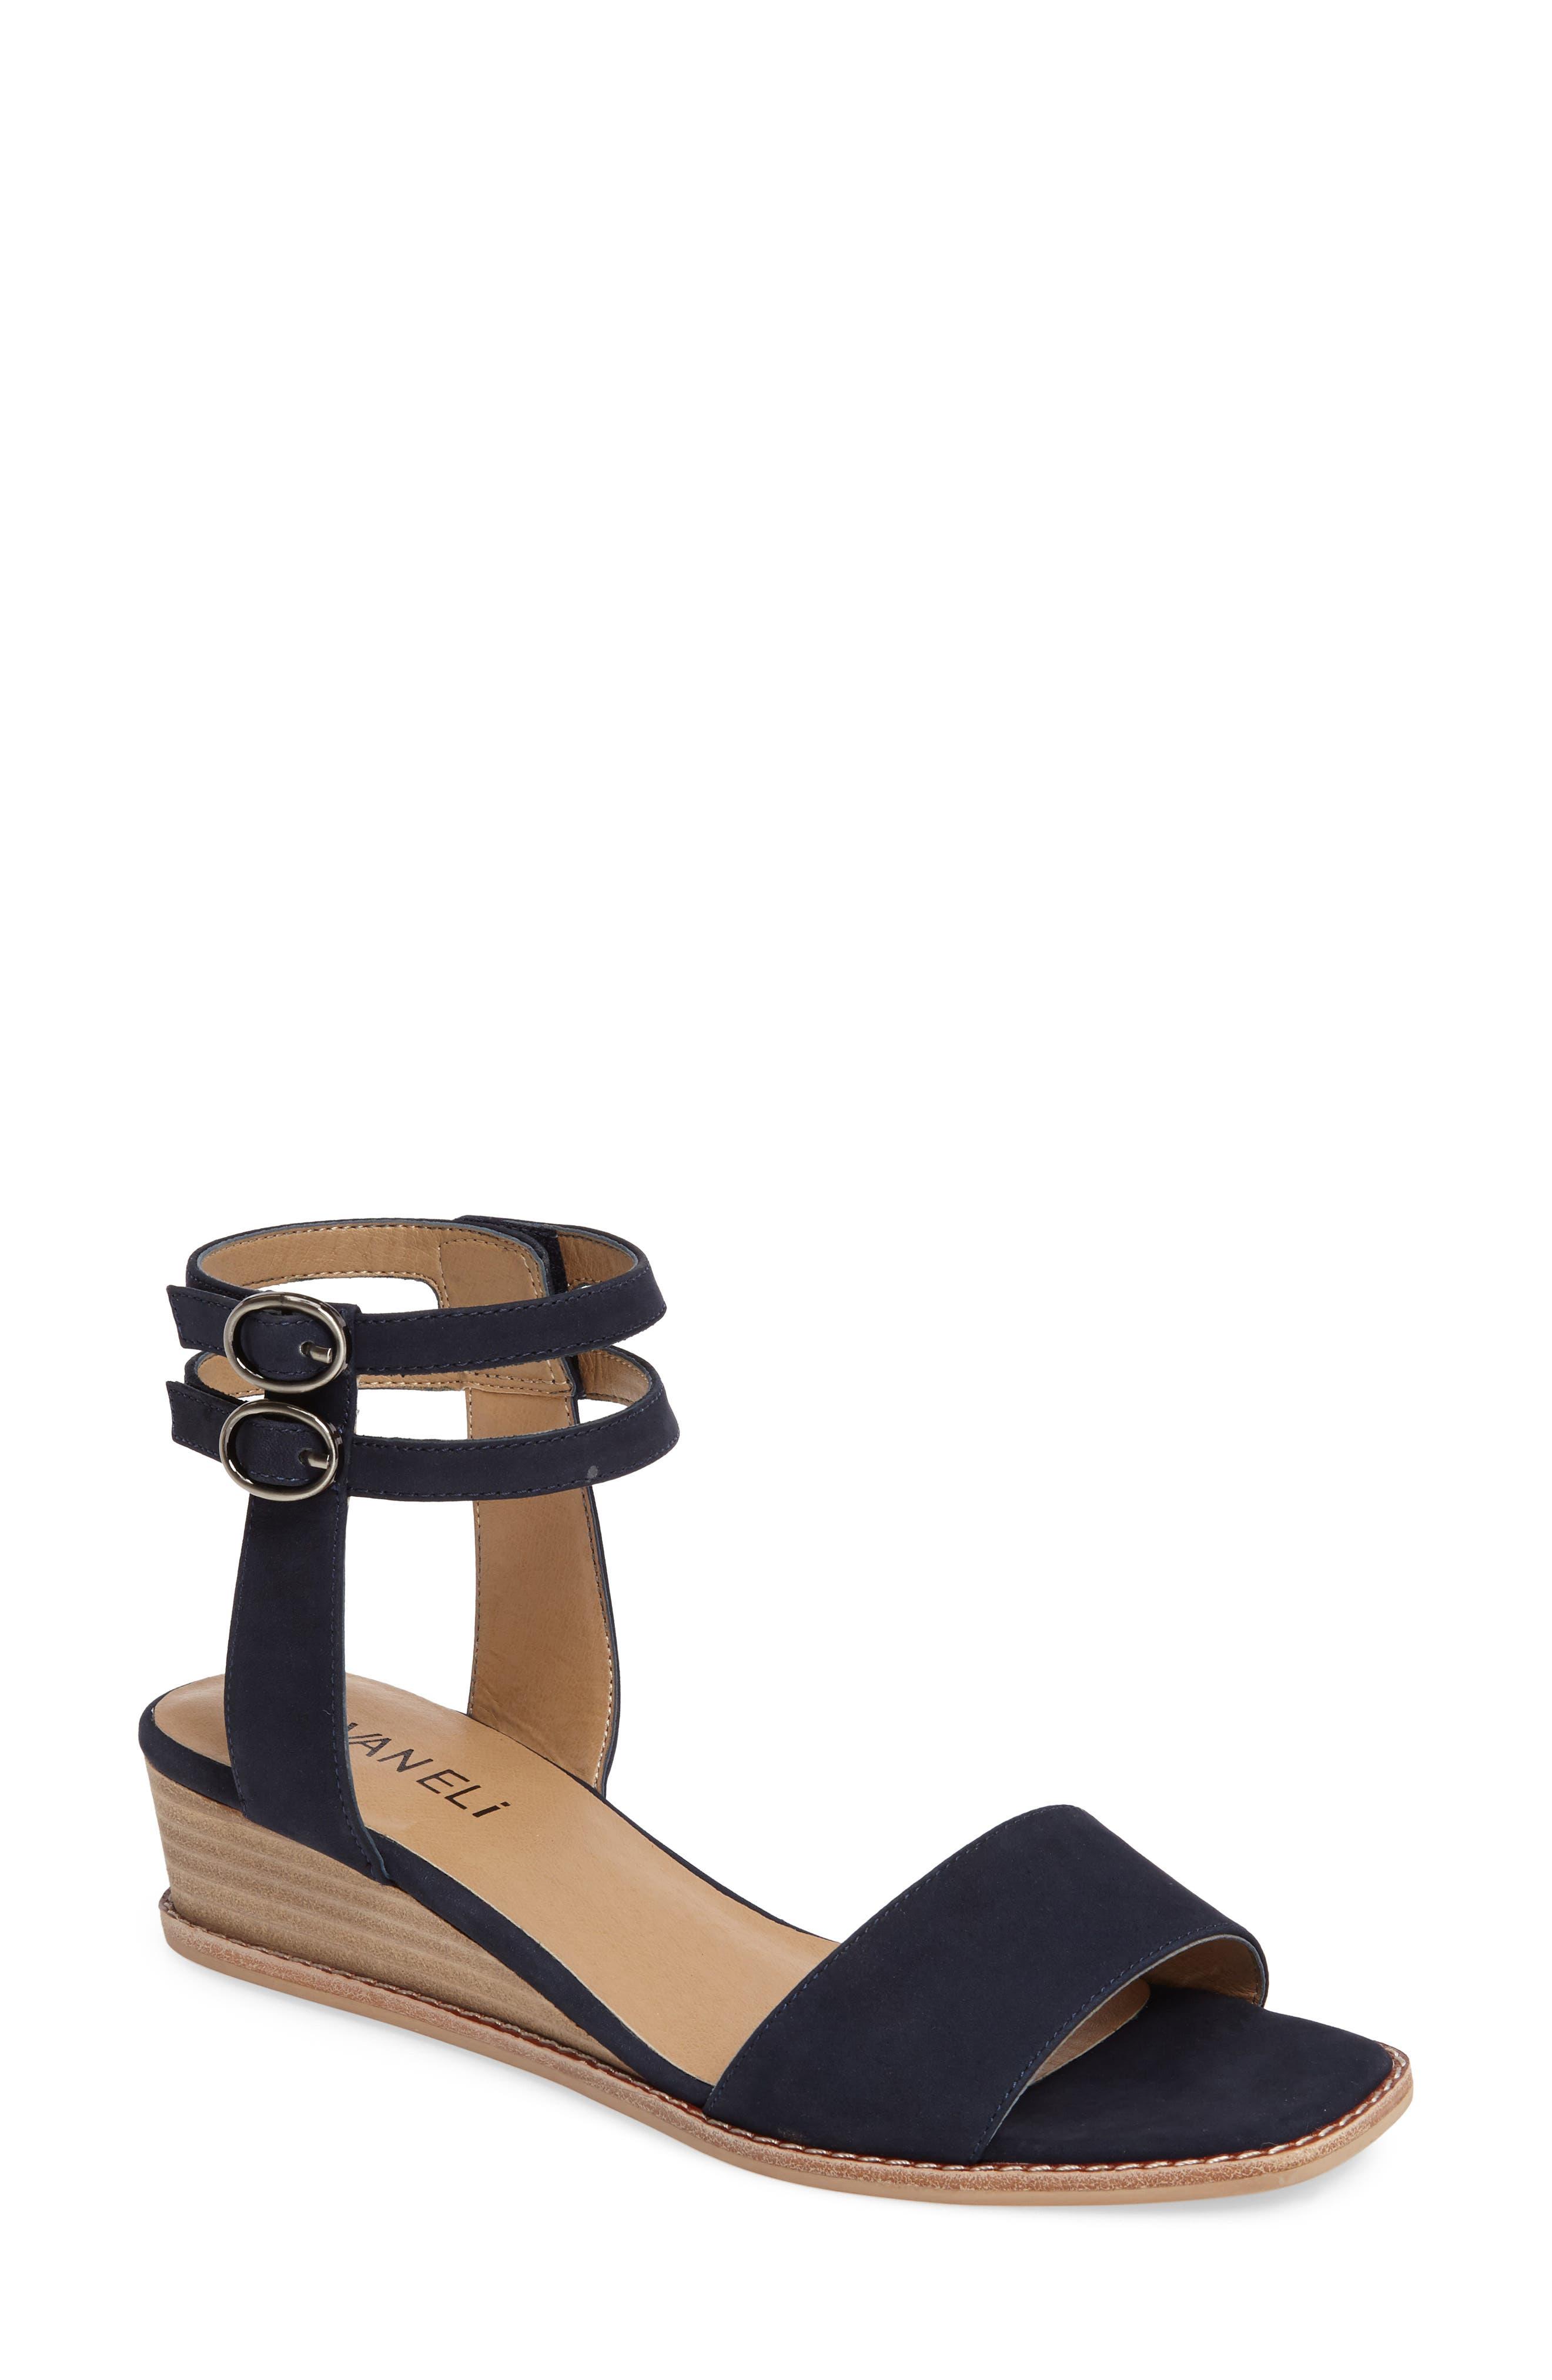 Jarita Ankle Strap Sandal,                         Main,                         color, Navy Leather